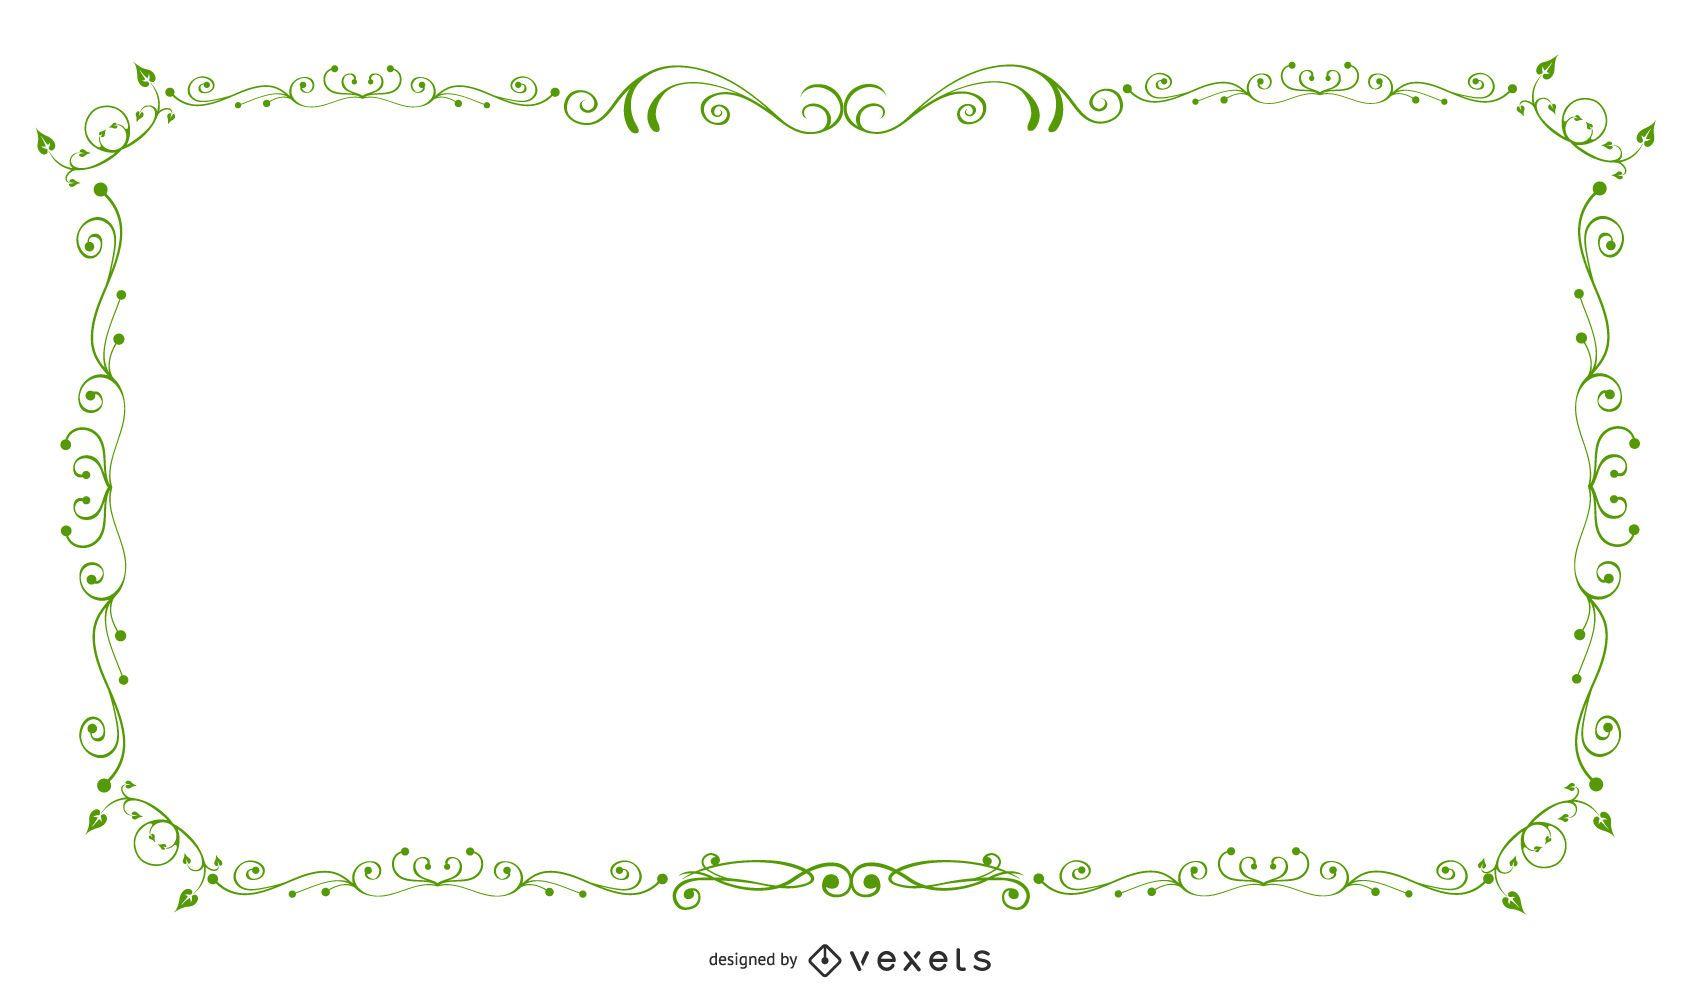 Banner de marco remolino verde